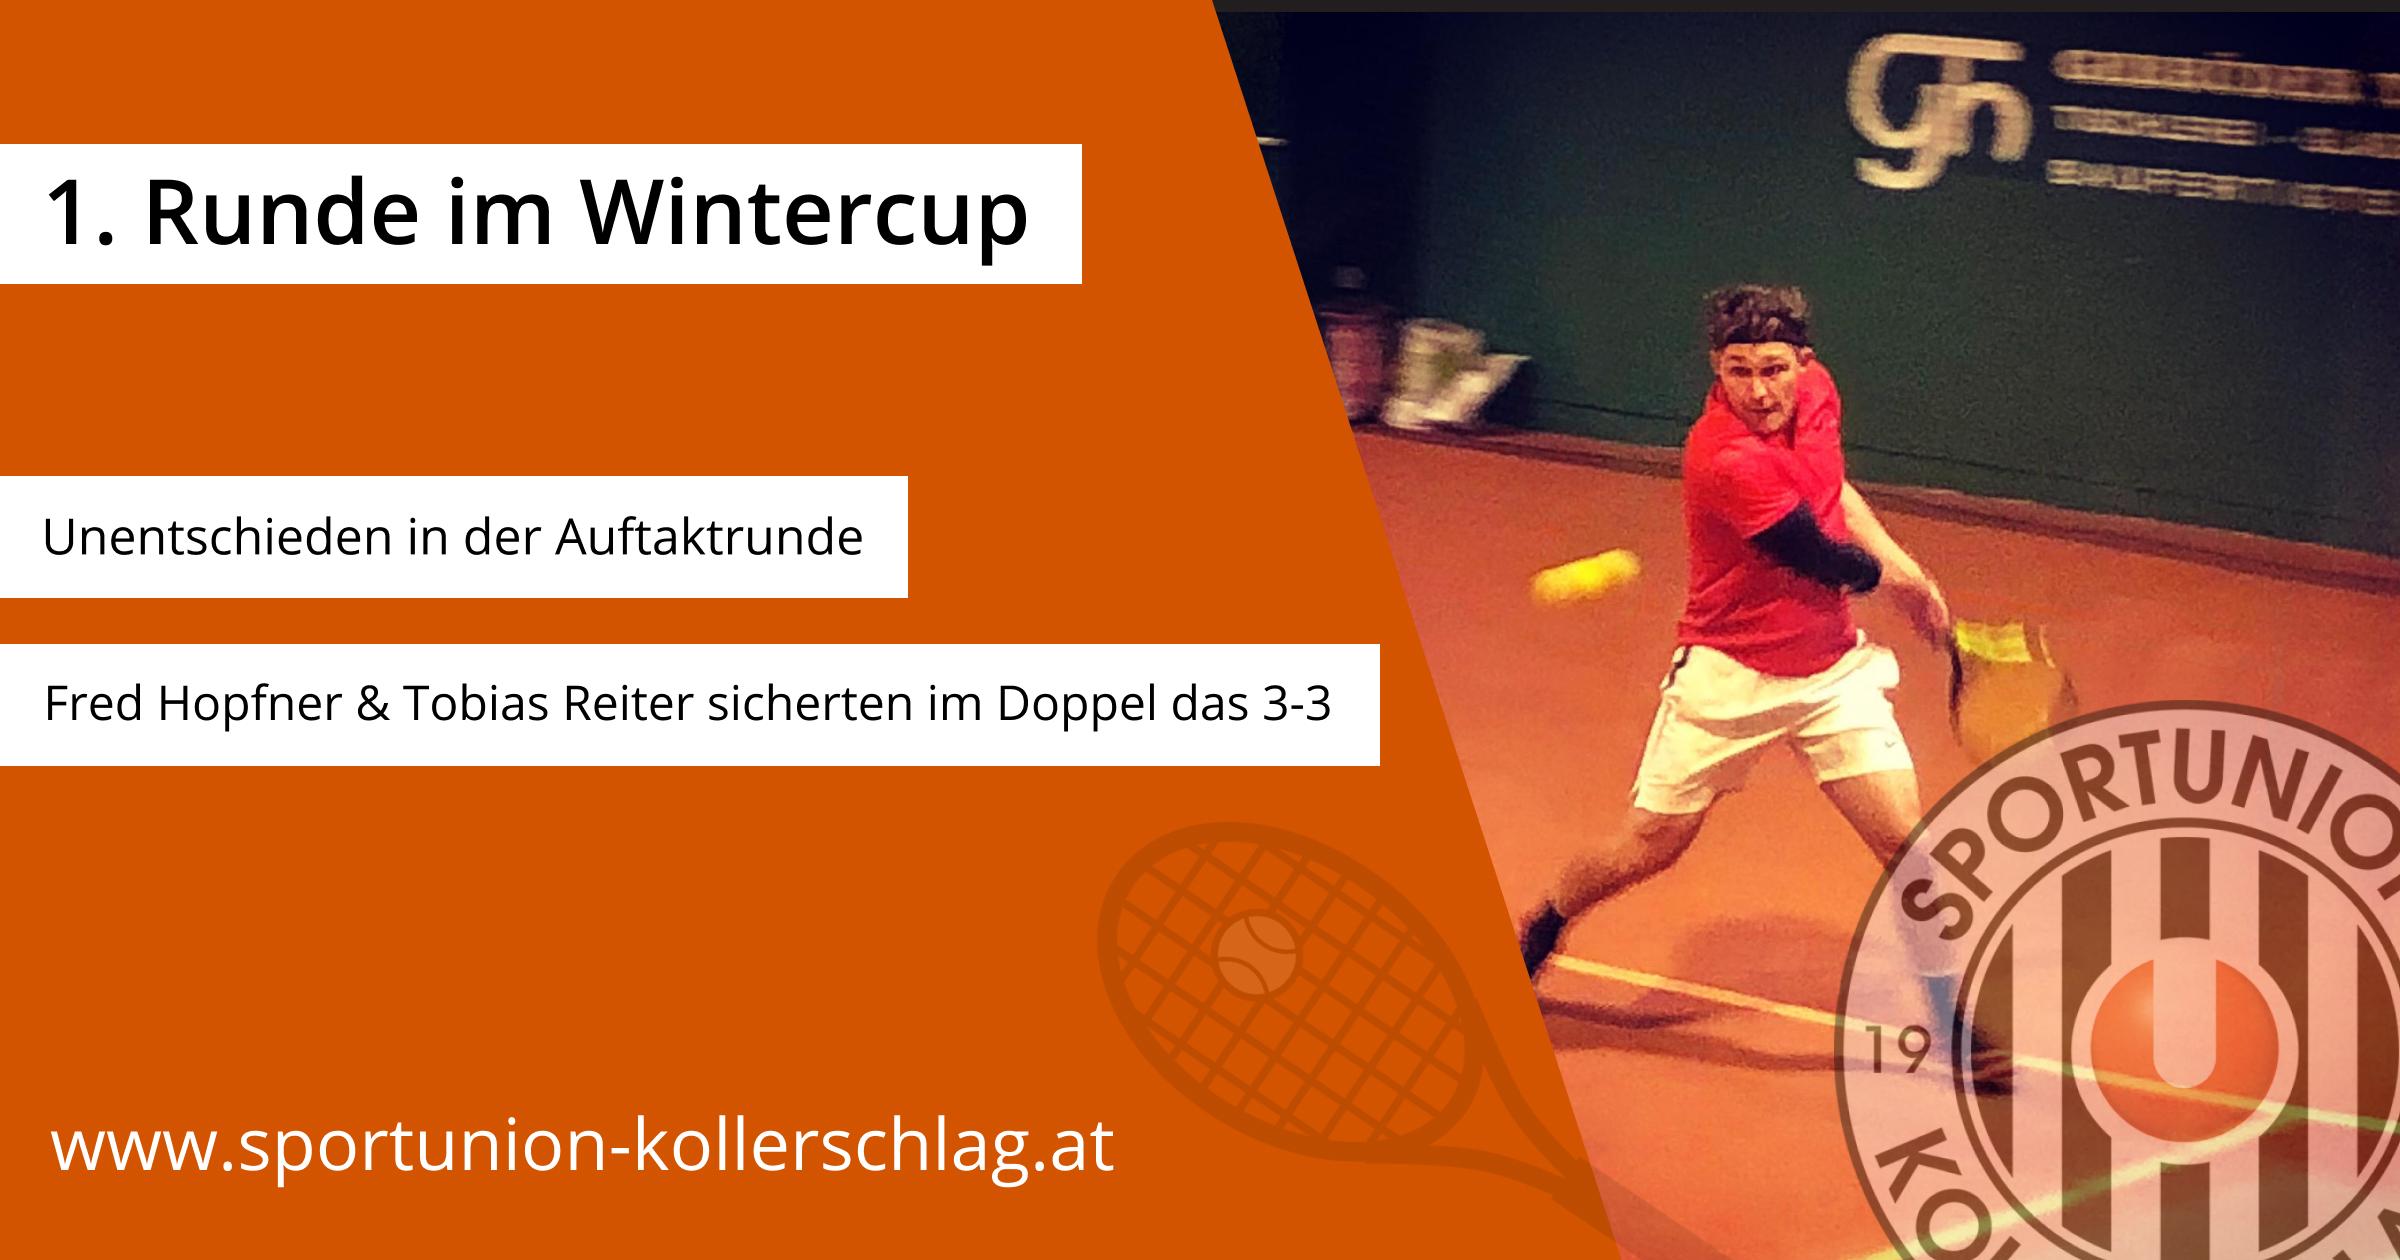 Auftaktrunde im Wintercup